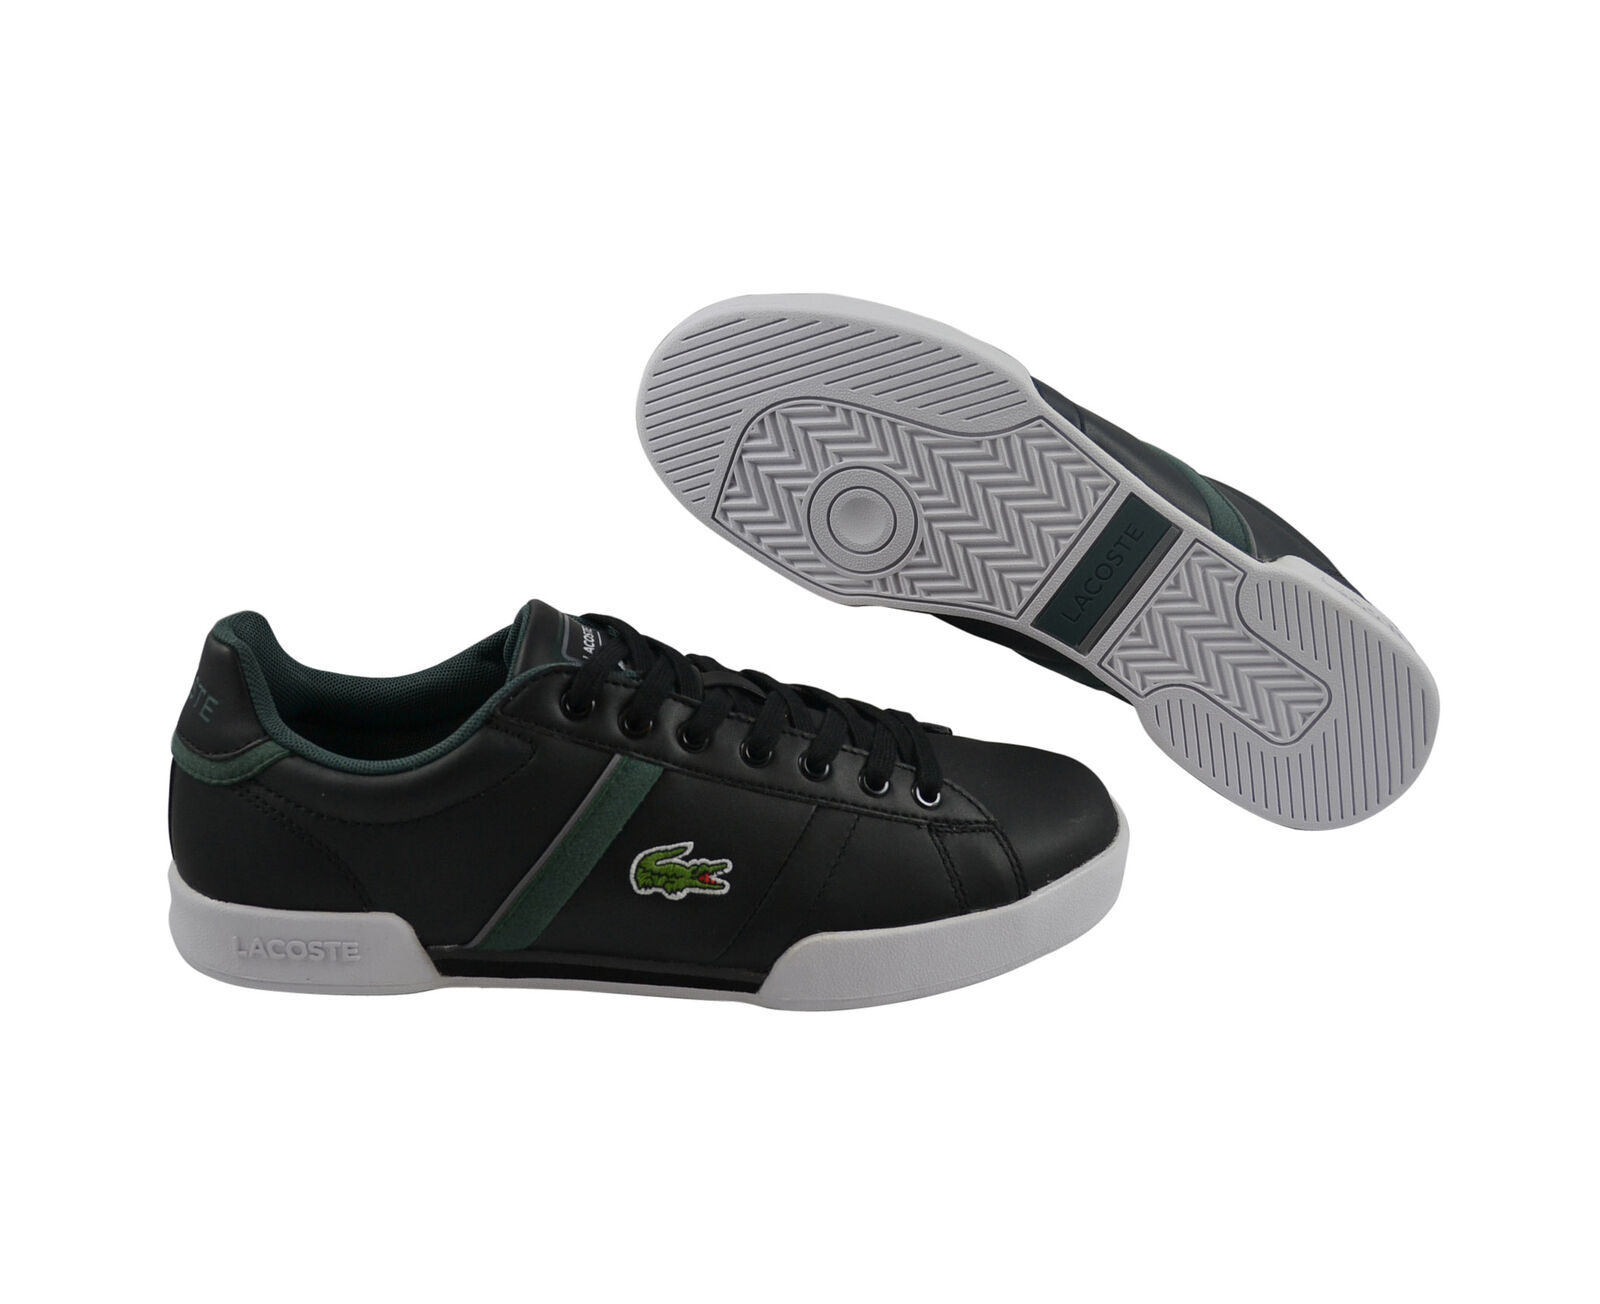 Lacoste deston put SPM negro negro zapatos cortos negro